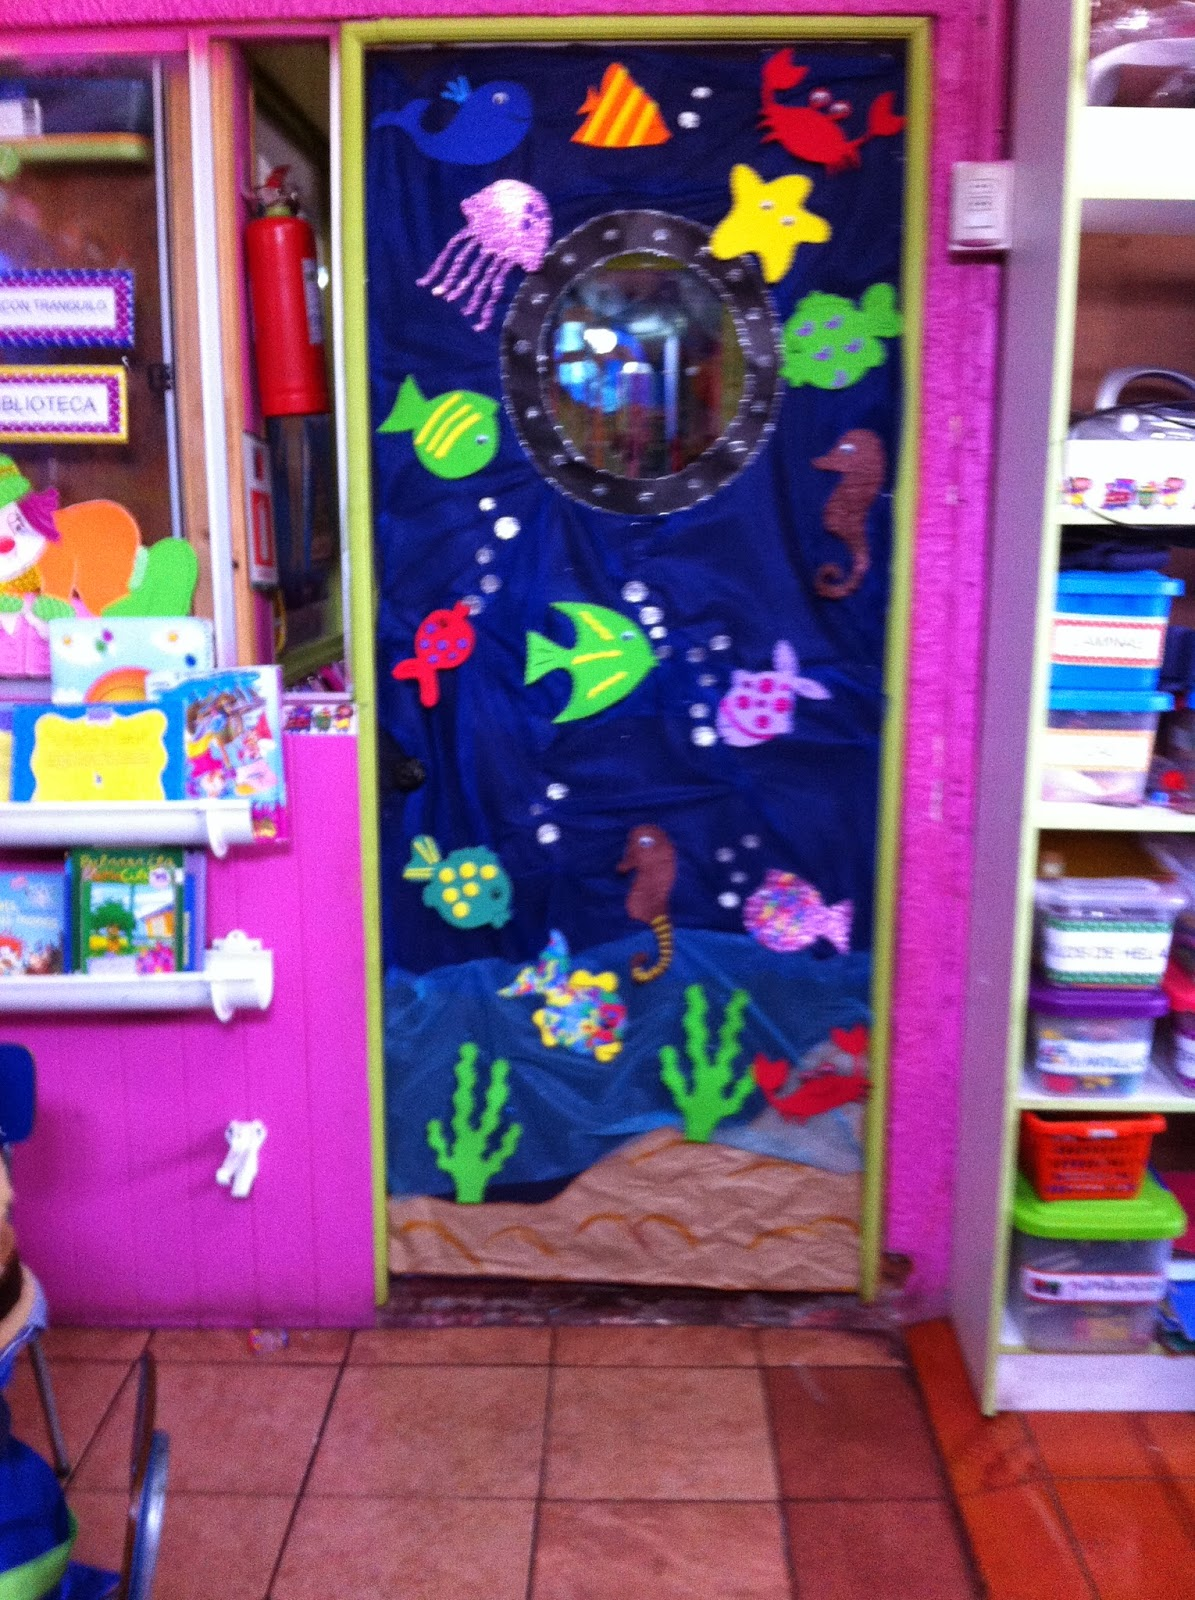 Decoracion Jardin Infantil ~ Jard?n Infantil  Un Mundo de Amor  Muestra de decoraci?n mes del